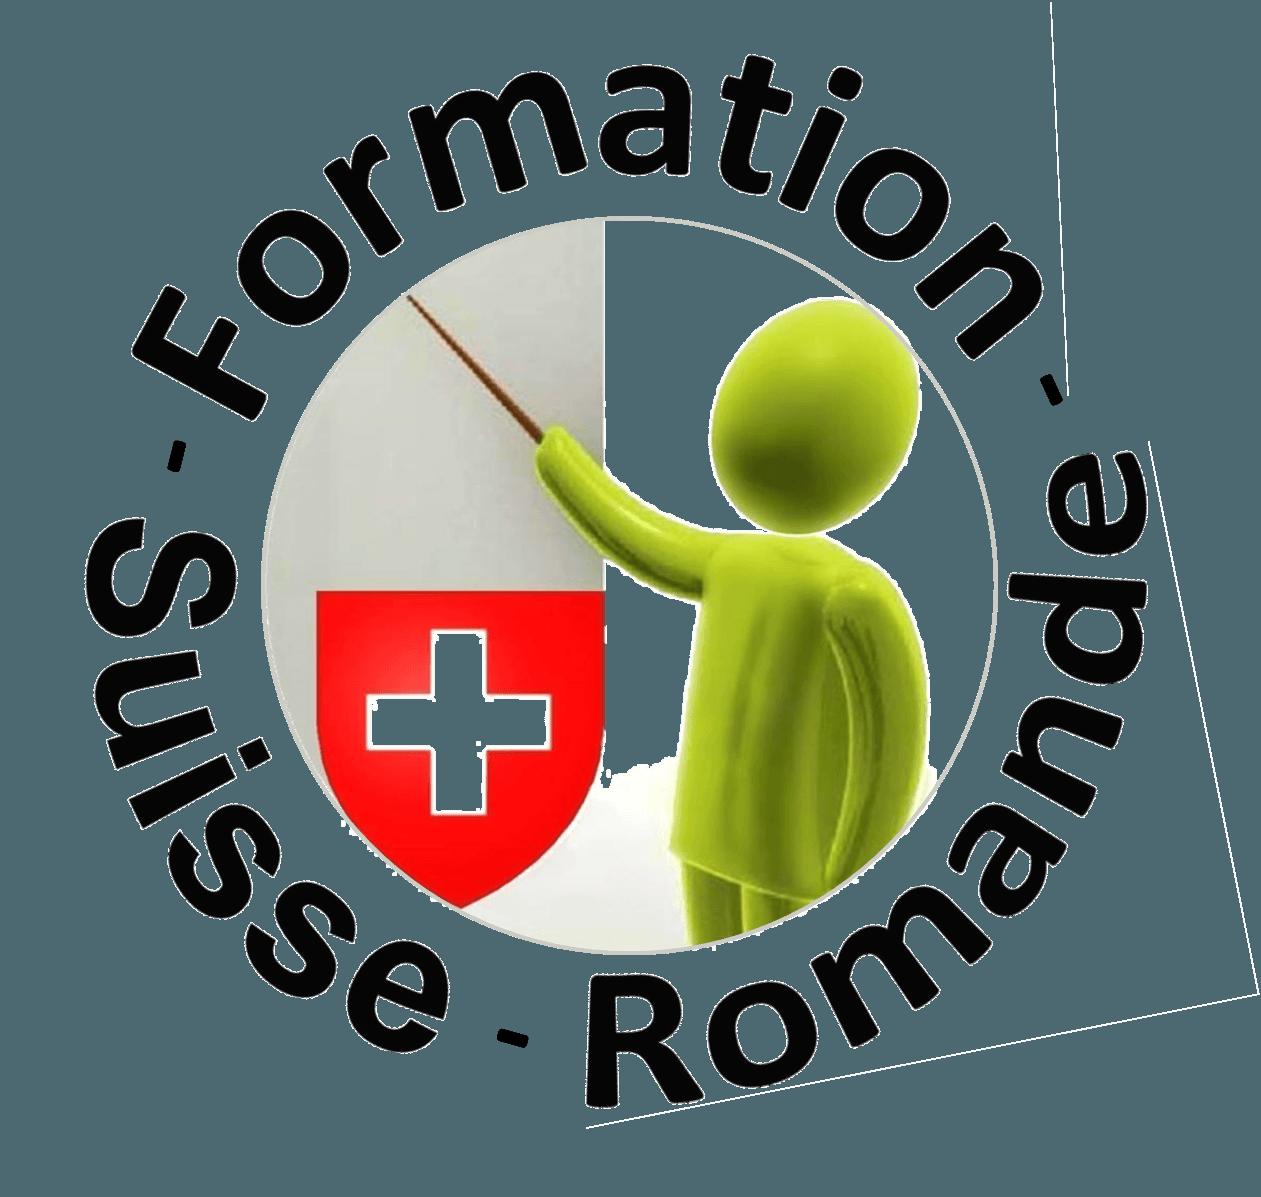 Formation Suisse Romande 🇨🇭